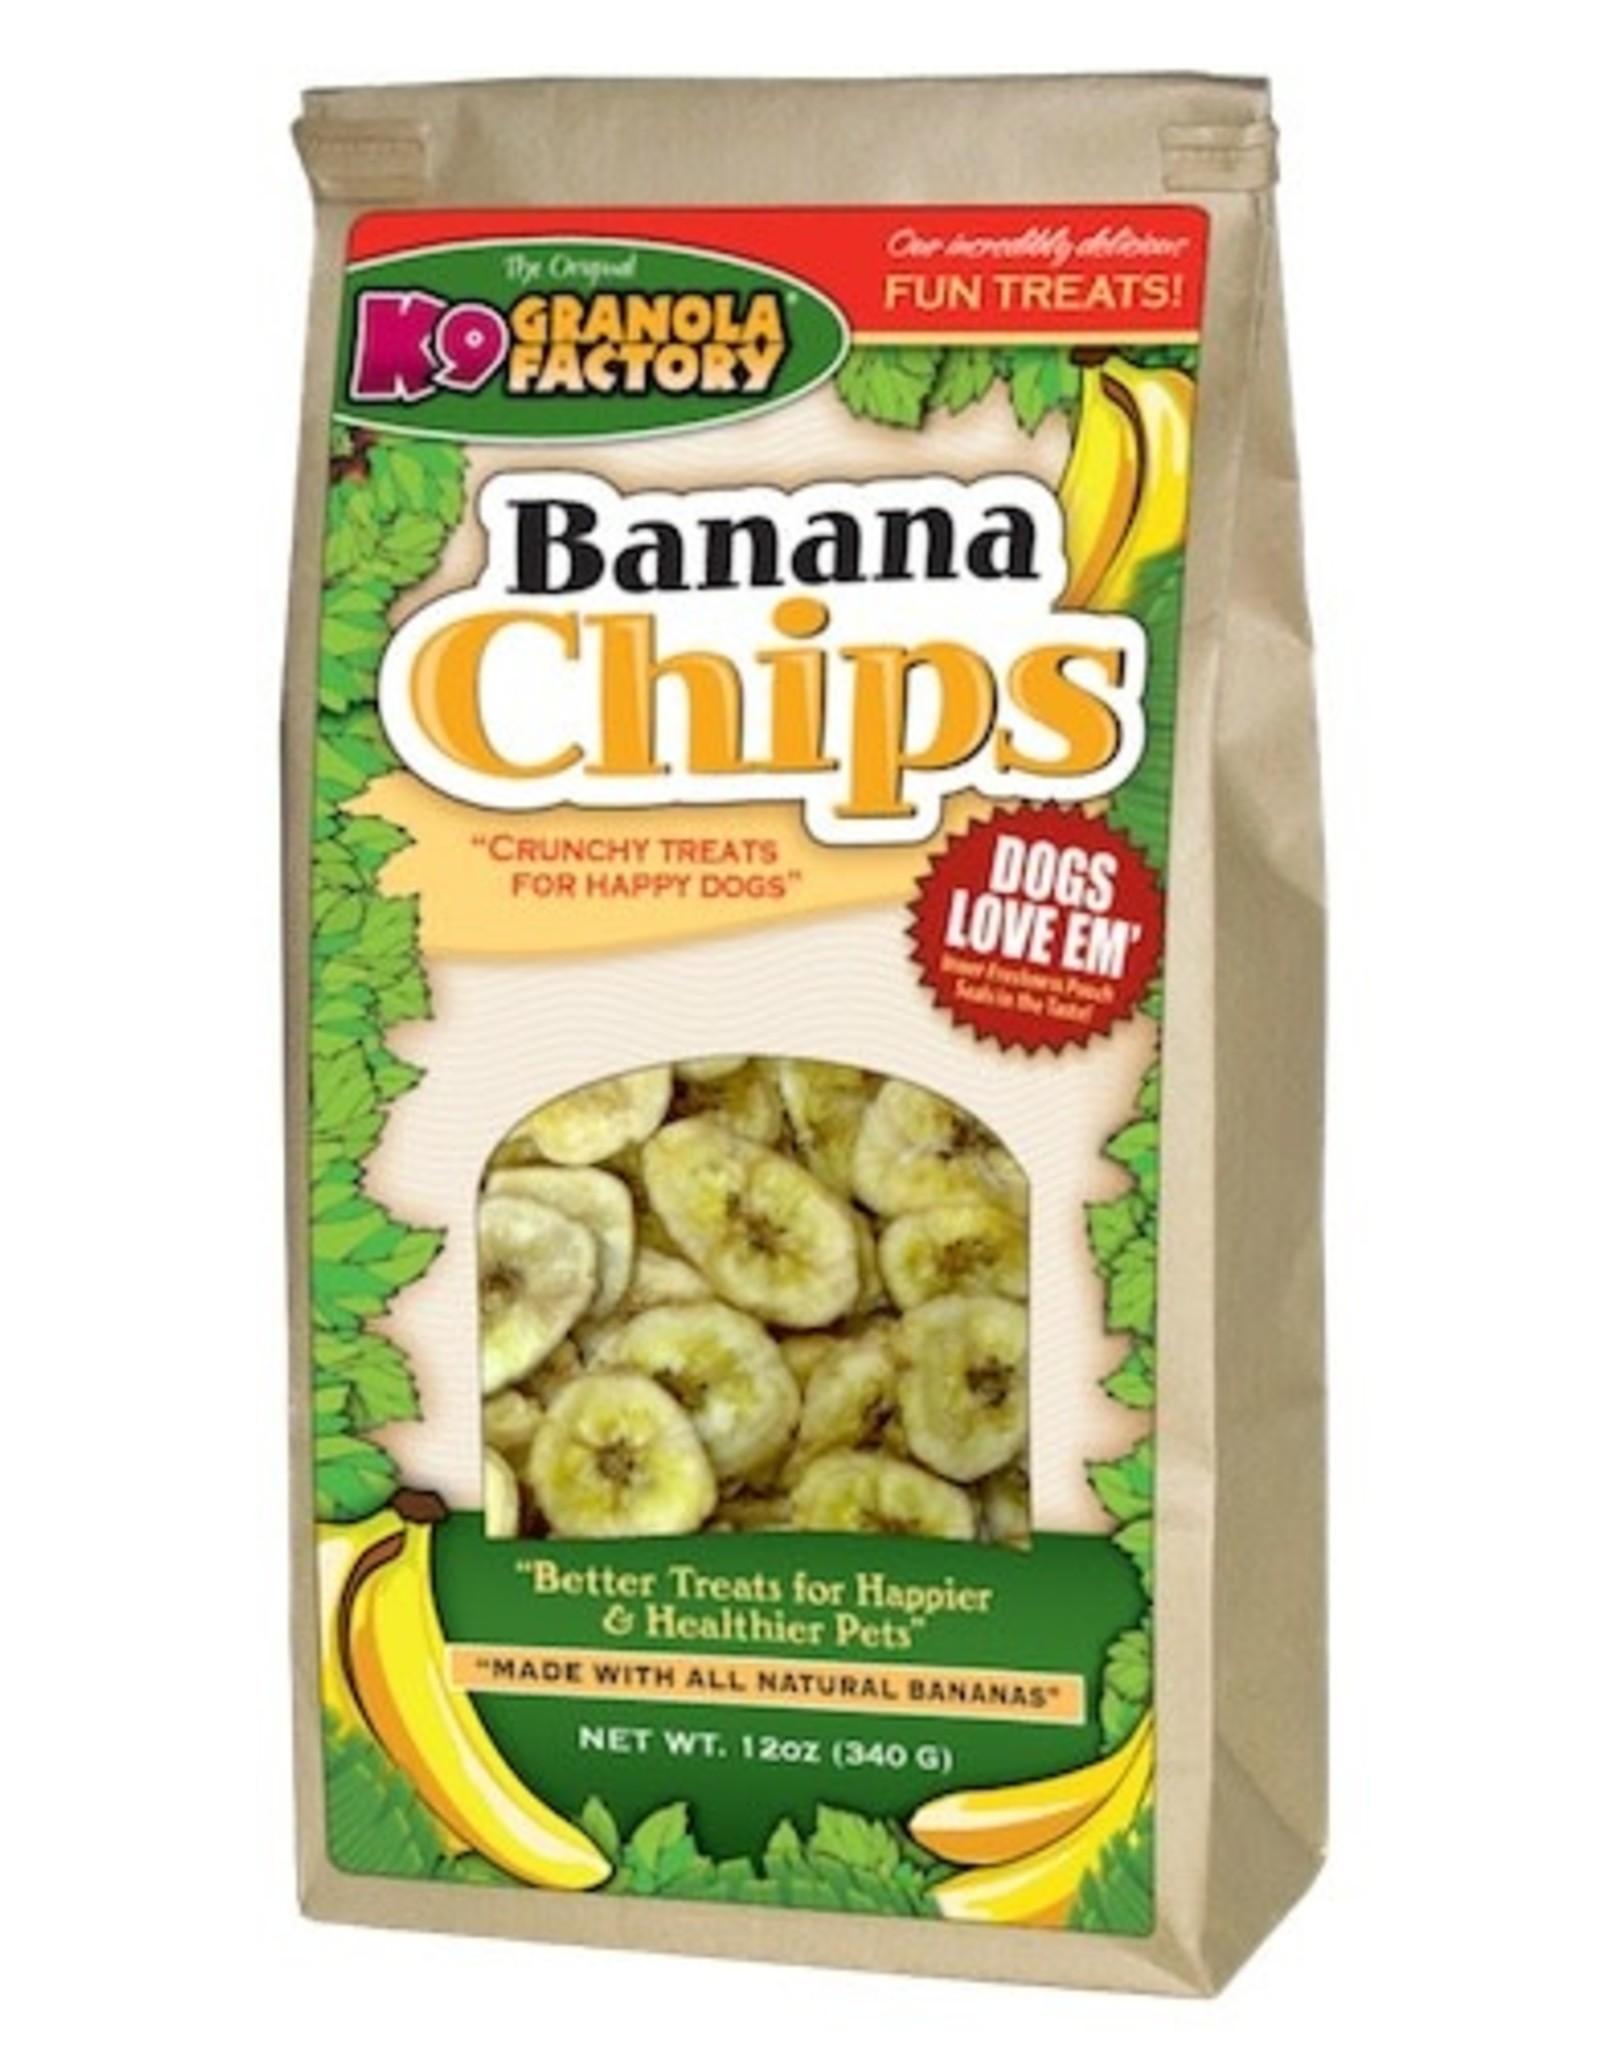 K9 Granola Factory K9 Granola Factory: Banana Chips, 12 oz